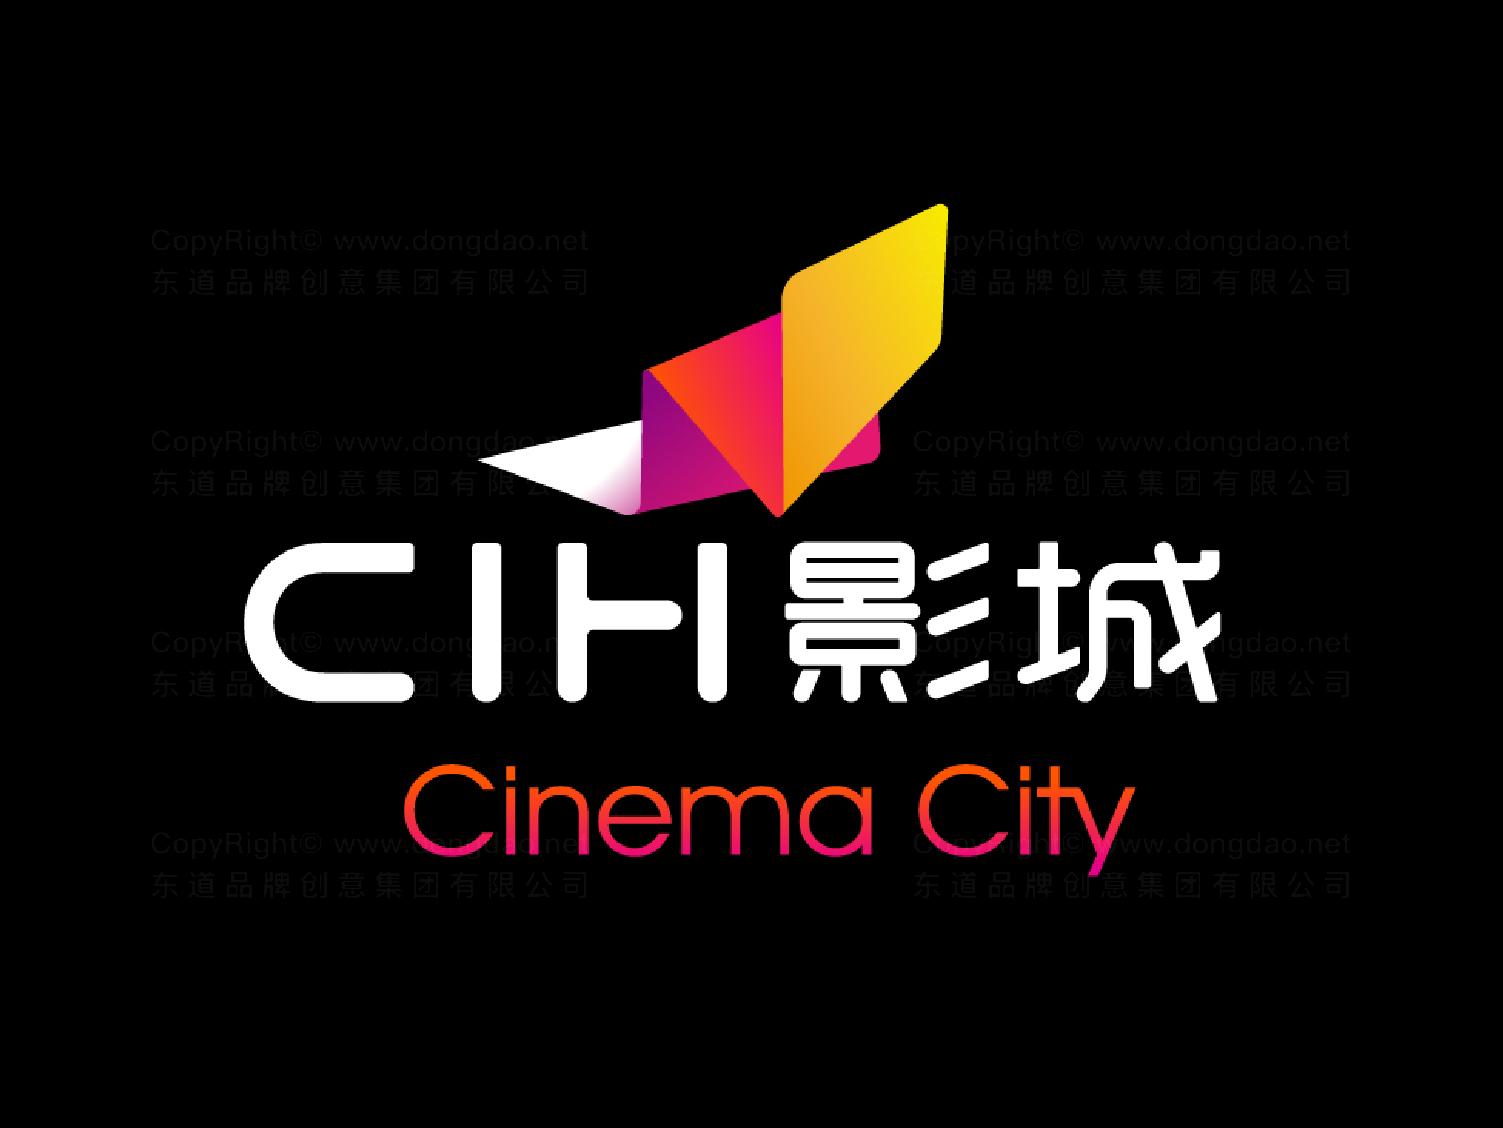 CIH影城电影院logo设计、vi设计应用场景_5